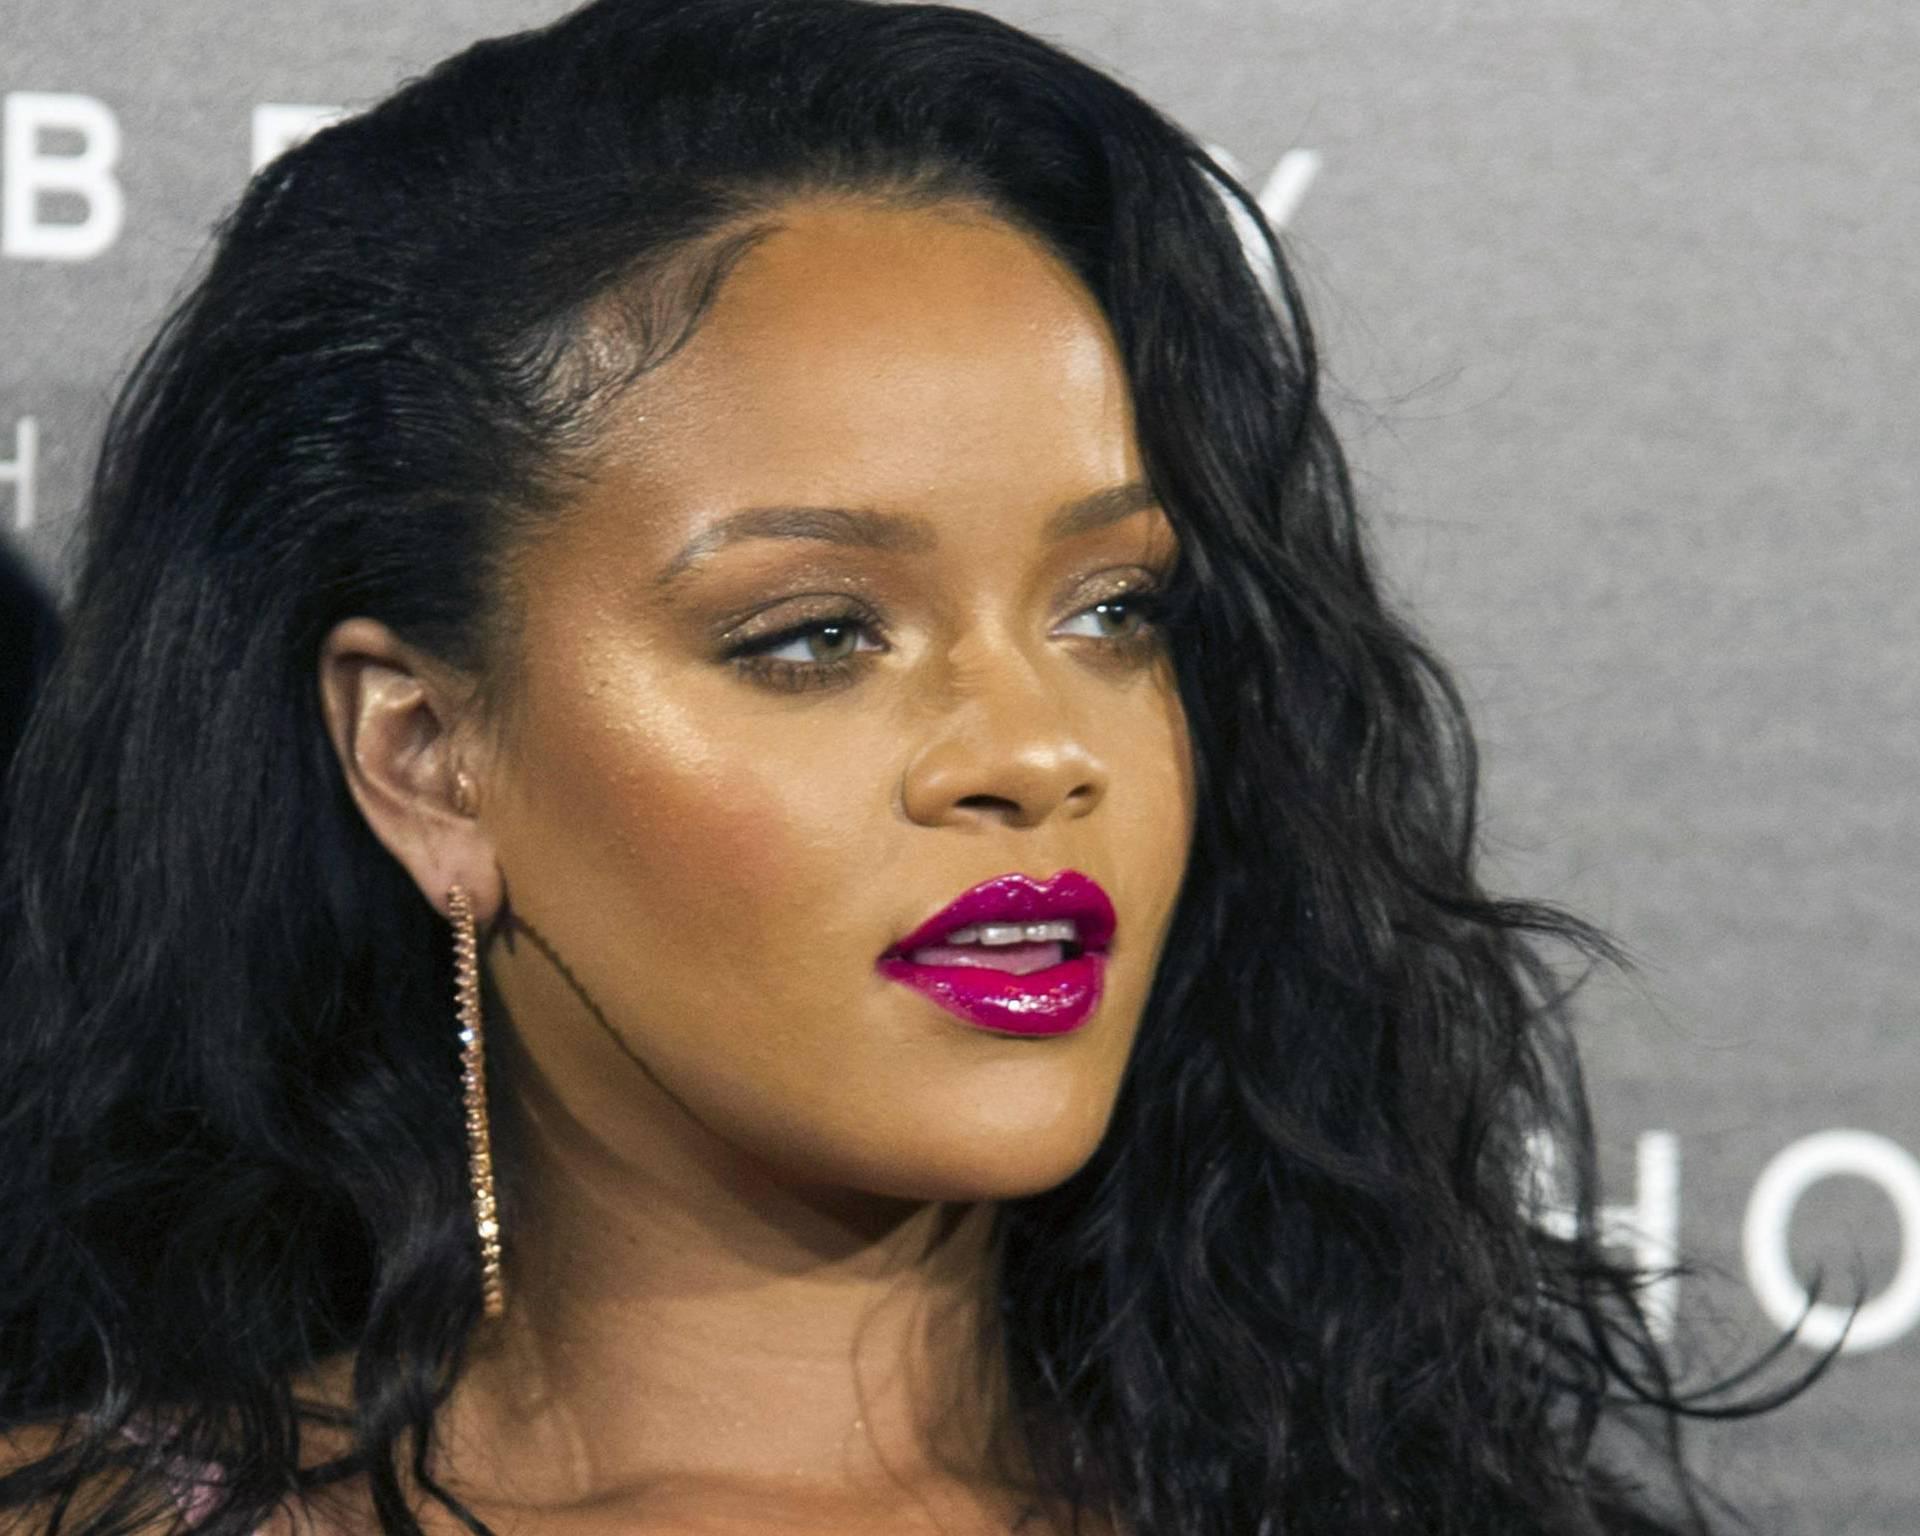 Rihanna Fenty Beauty Launch in Madrid